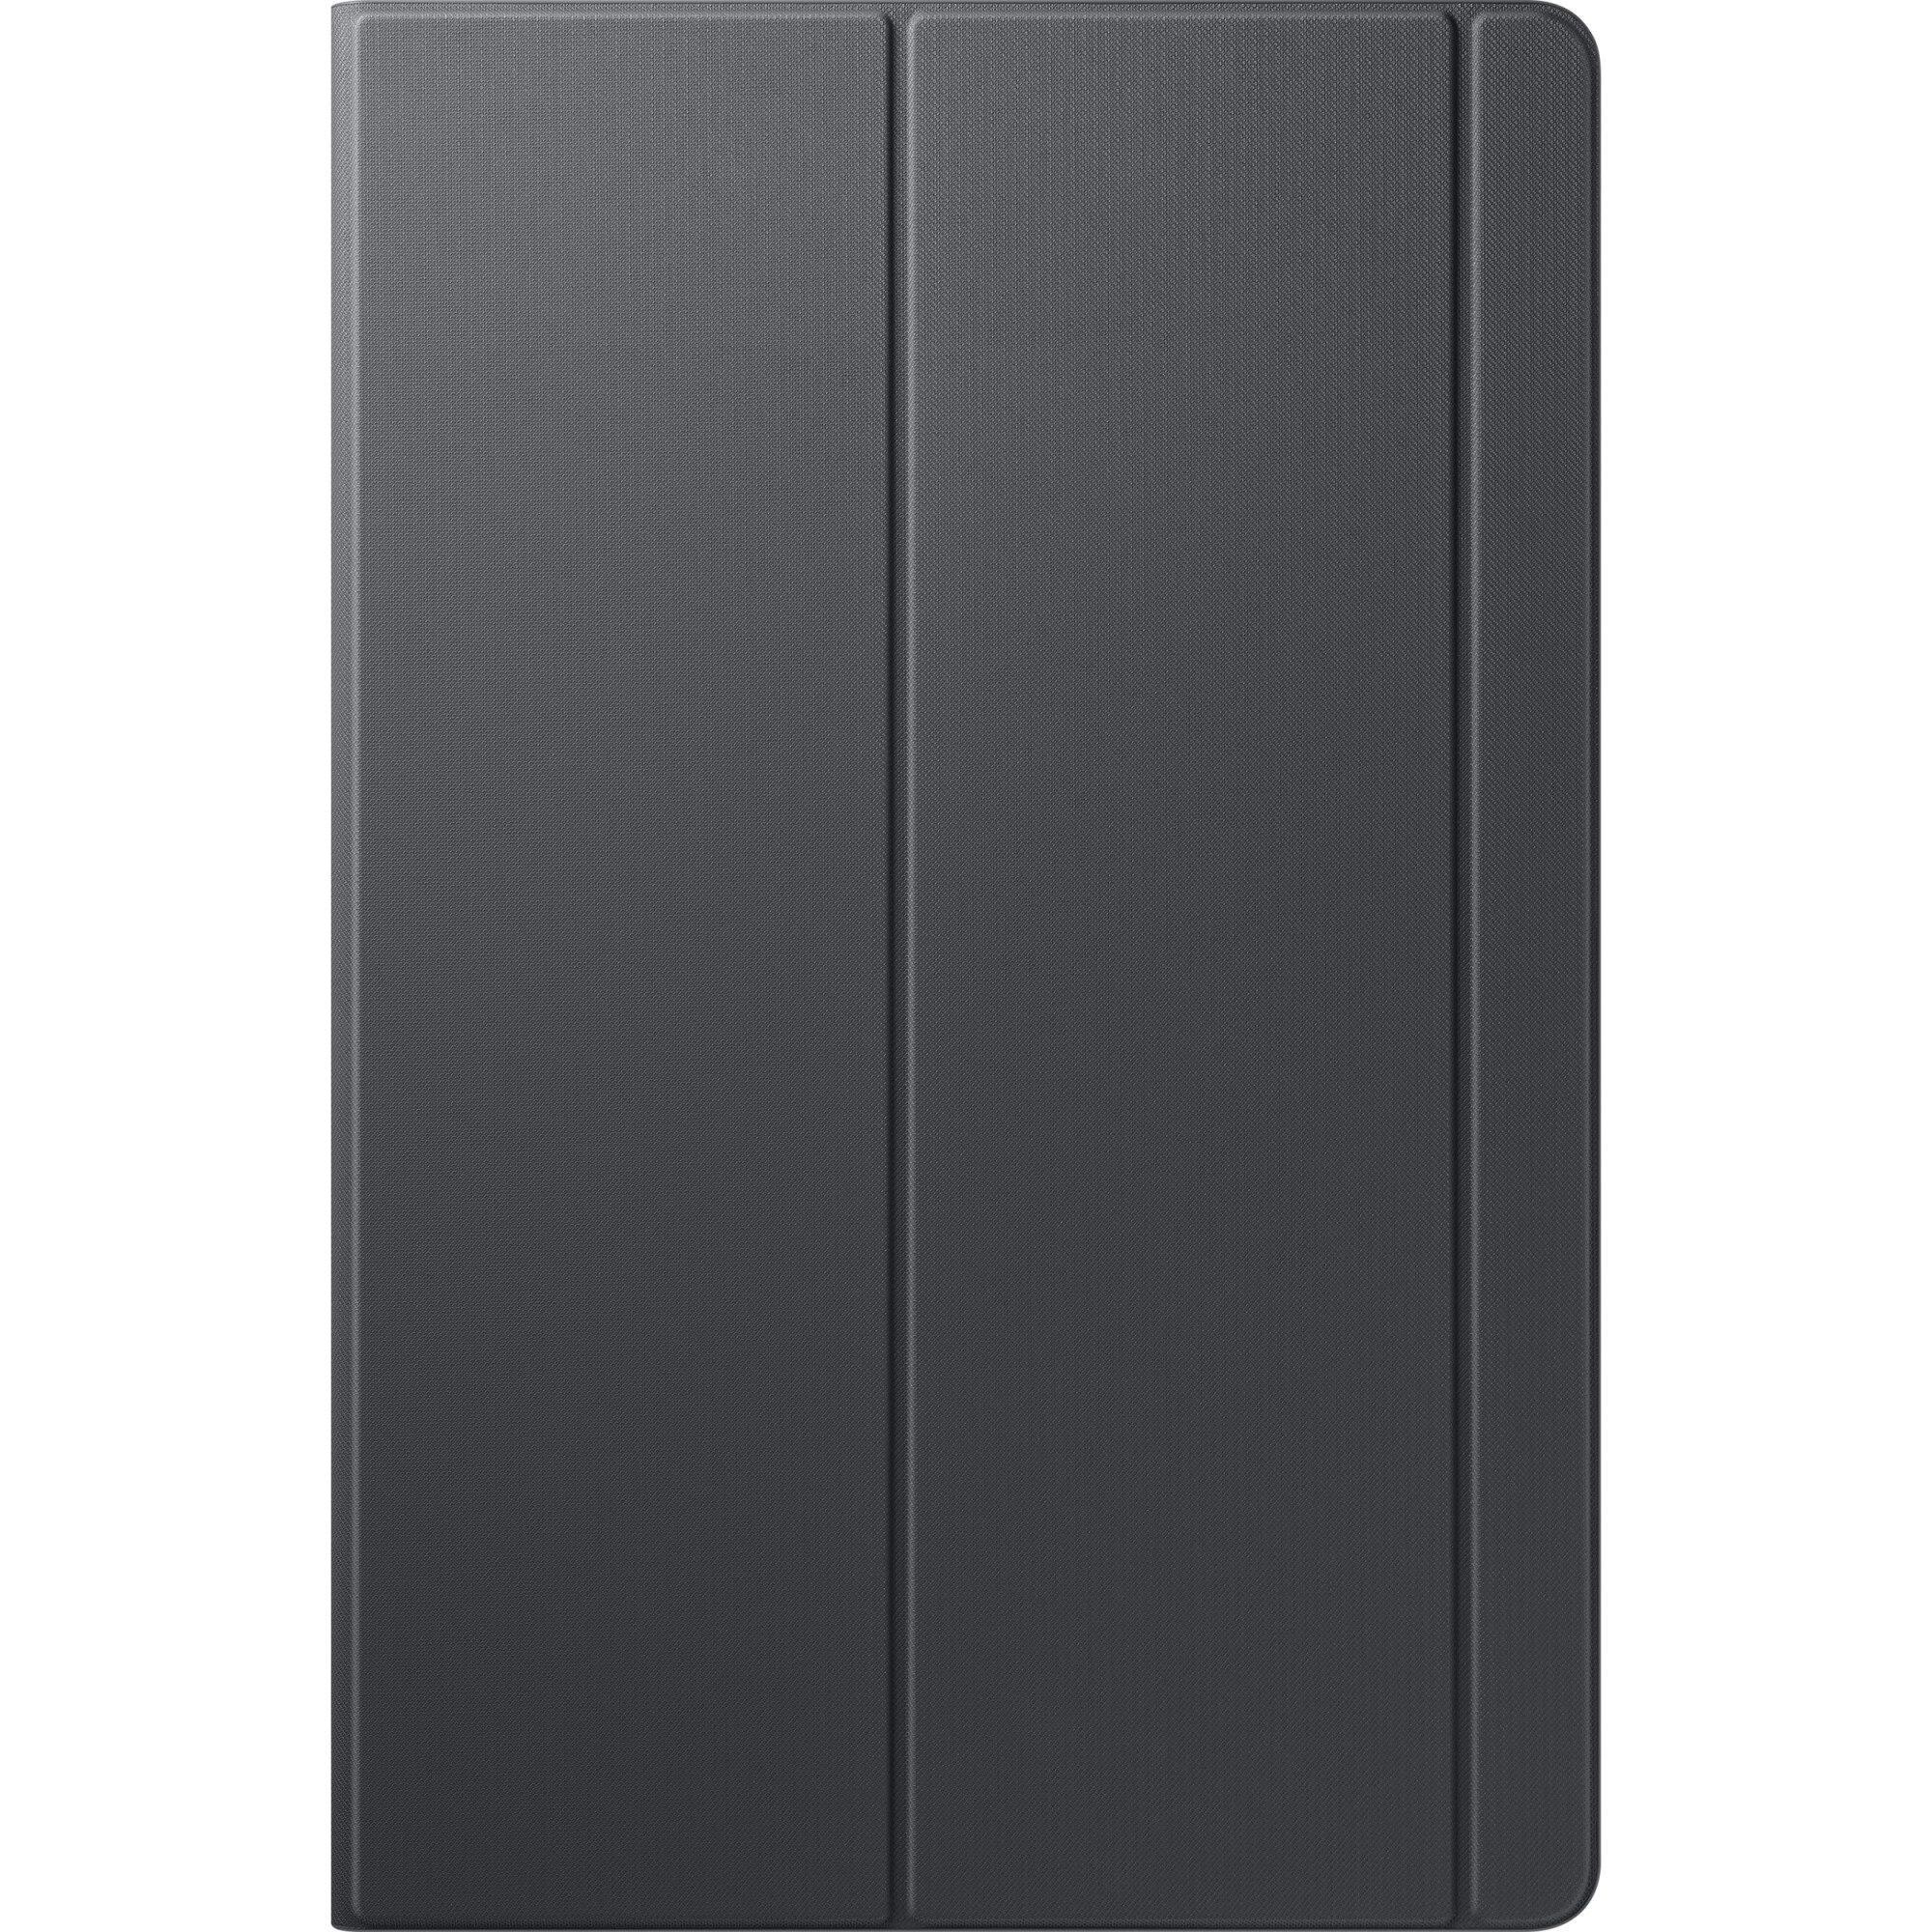 Fotografie Husa de protectie Samsung Book Cover pentru Galaxy Tab S6, Gray